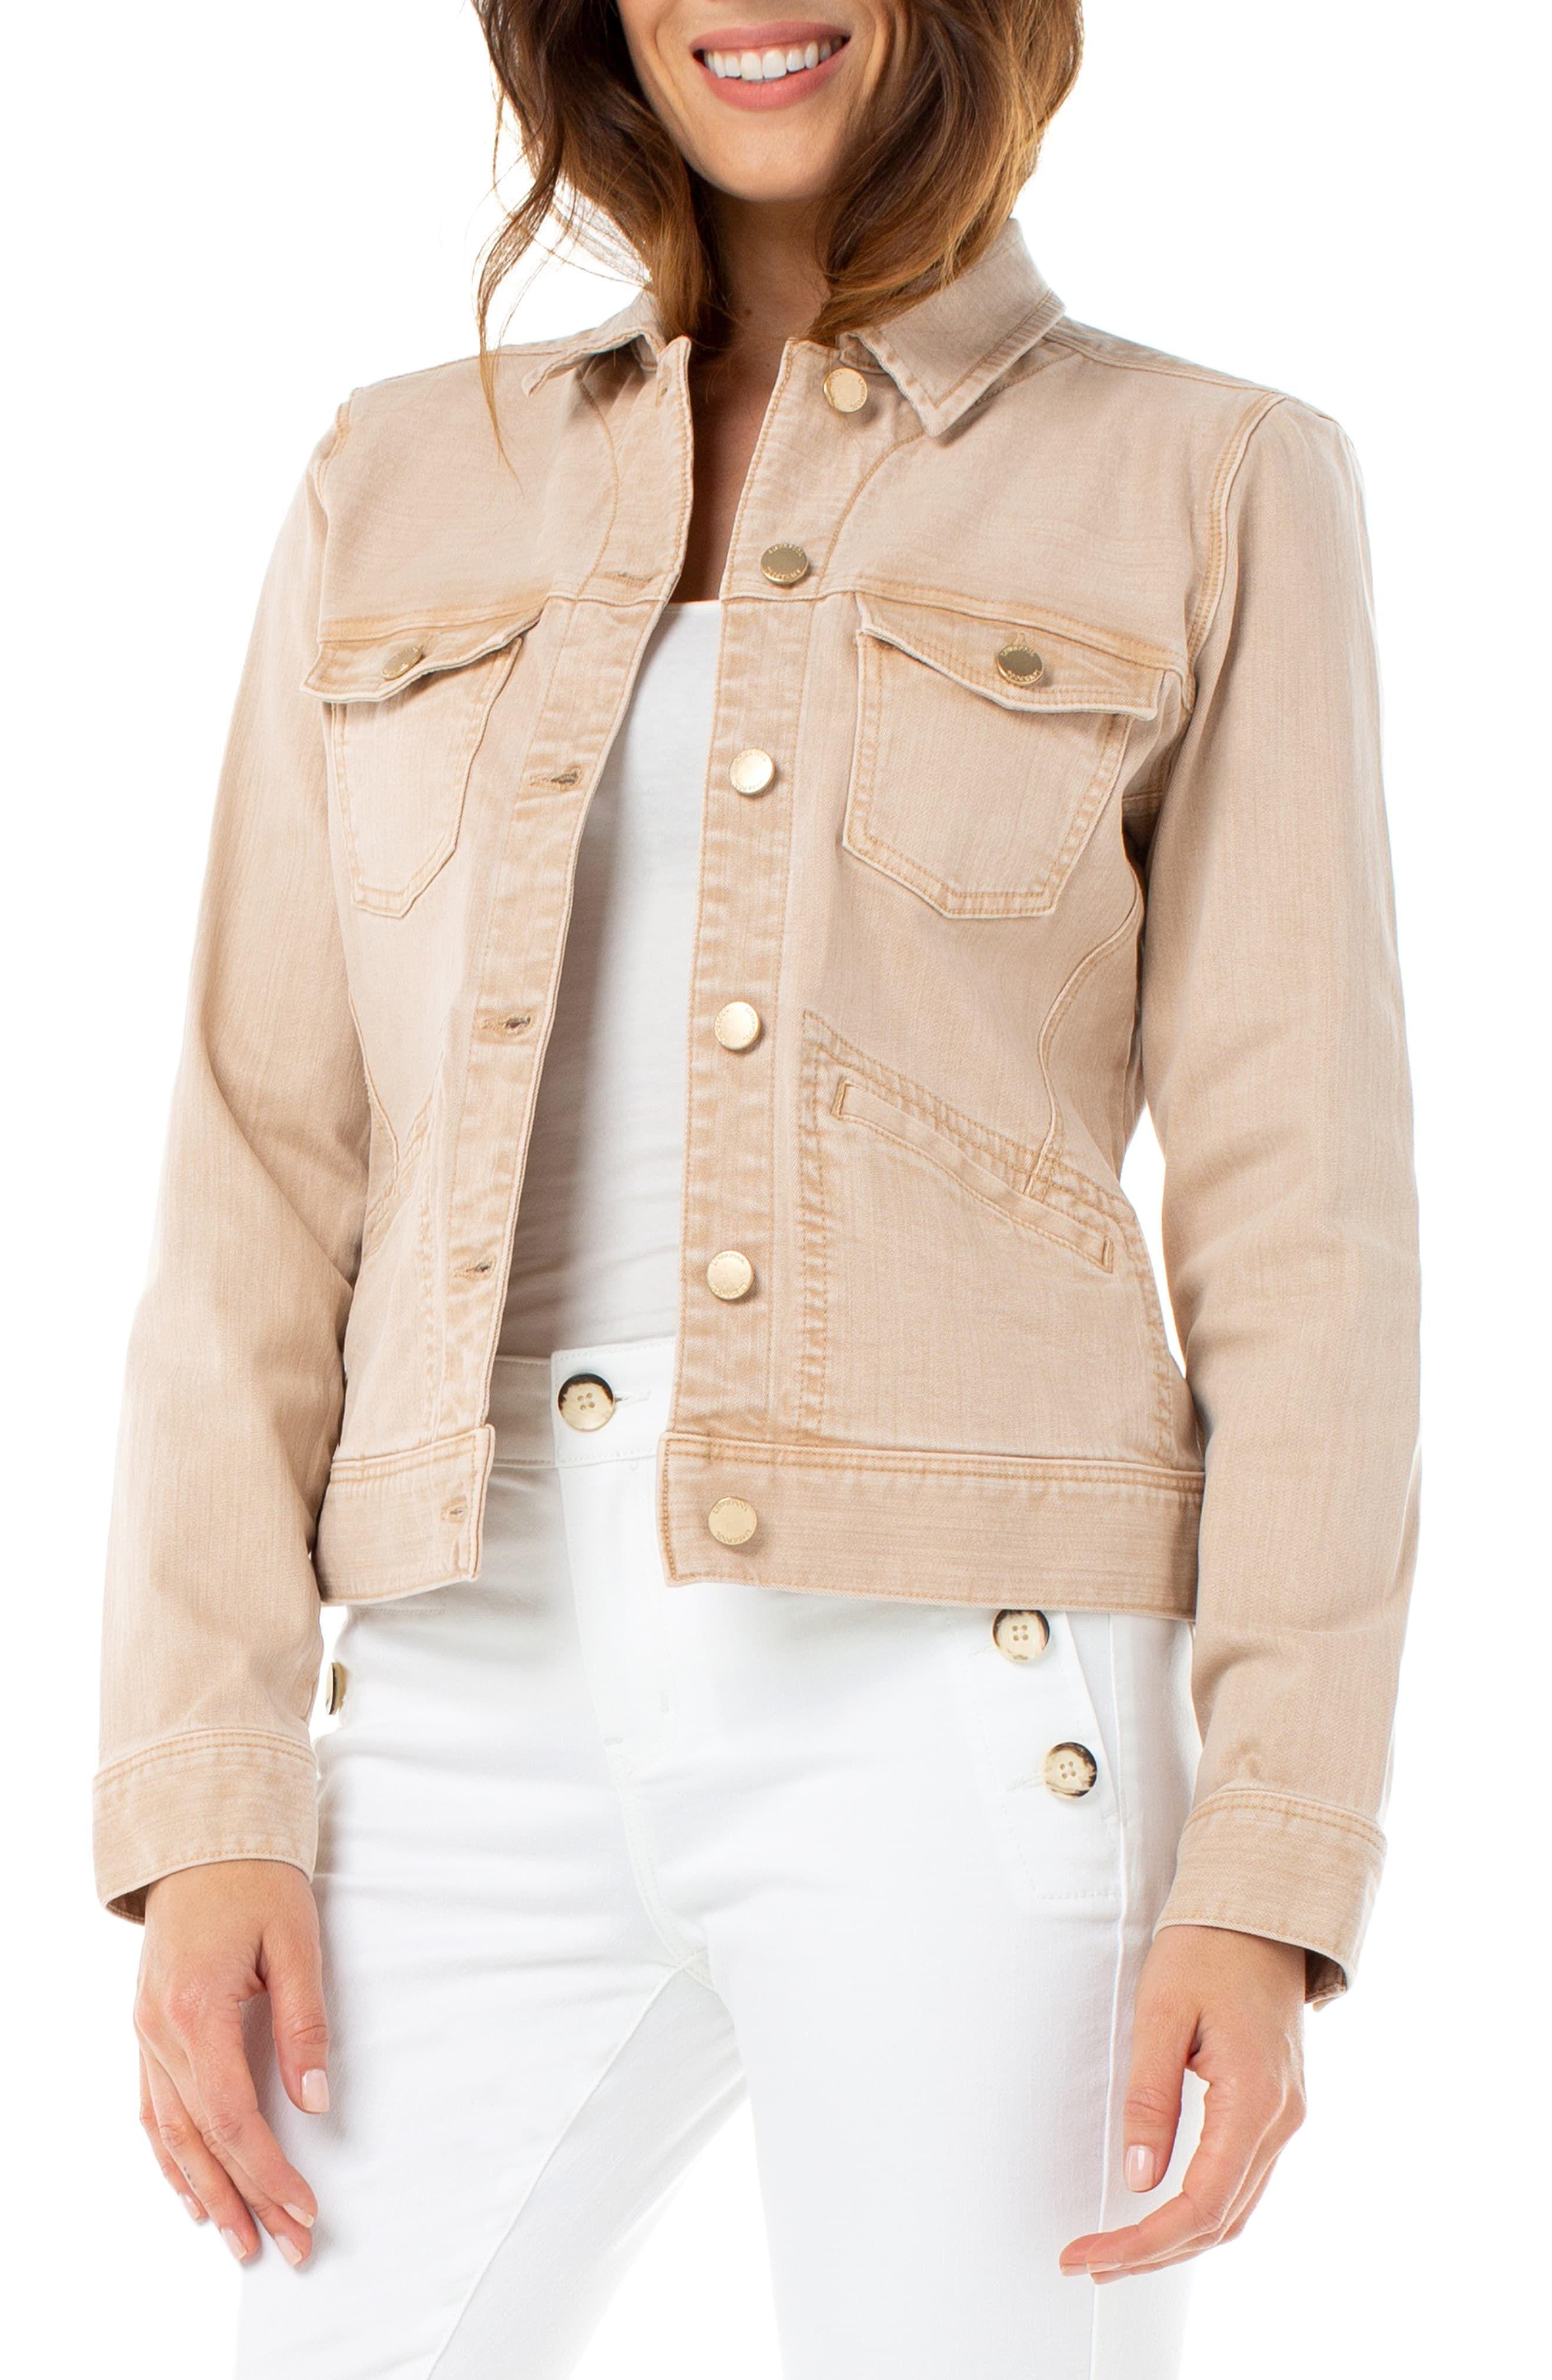 Liverpool Denim Jacket Nordstrom Denim Jacket Women Denim Jacket Jackets For Women [ 4048 x 2640 Pixel ]